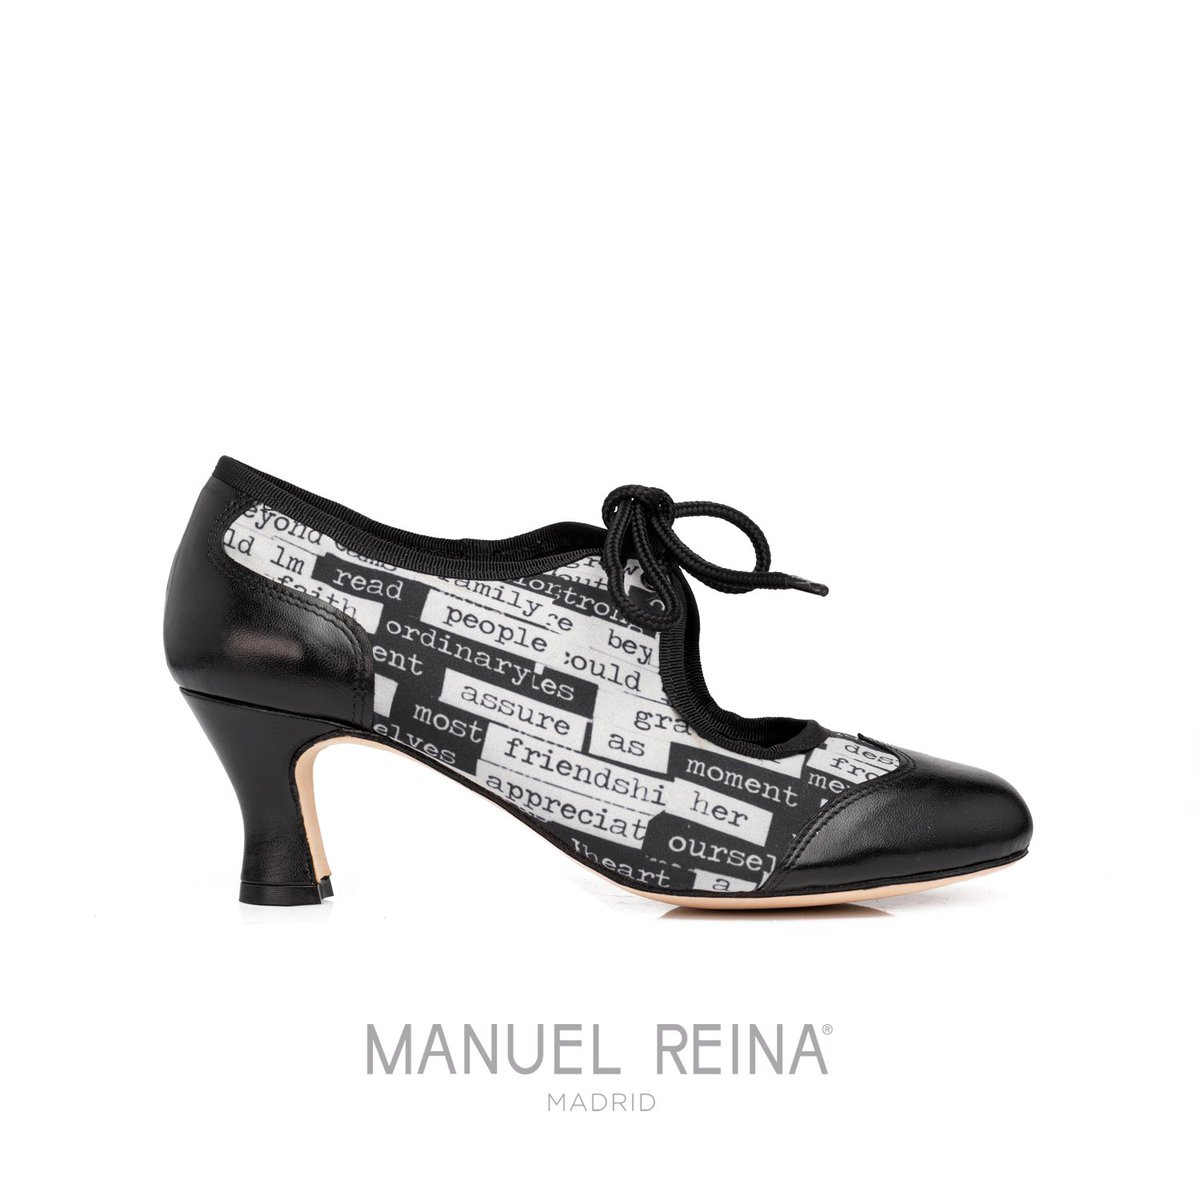 test Twitter Media - Nueva colección: Zapatos para bailar Swing ⚡️⚡️⚡️⚡️ New collection: Swing dance shoes ⚡️⚡️⚡️⚡️ Para vosotros bailarines 🌟 Only for dancers • • • #neworleans #swing #dancer #nola #secondbase #inning #thirdbase #bases #firstbase #manuelreina #mitt #manuelreinashoes #homerun https://t.co/HFgRYrAtLS